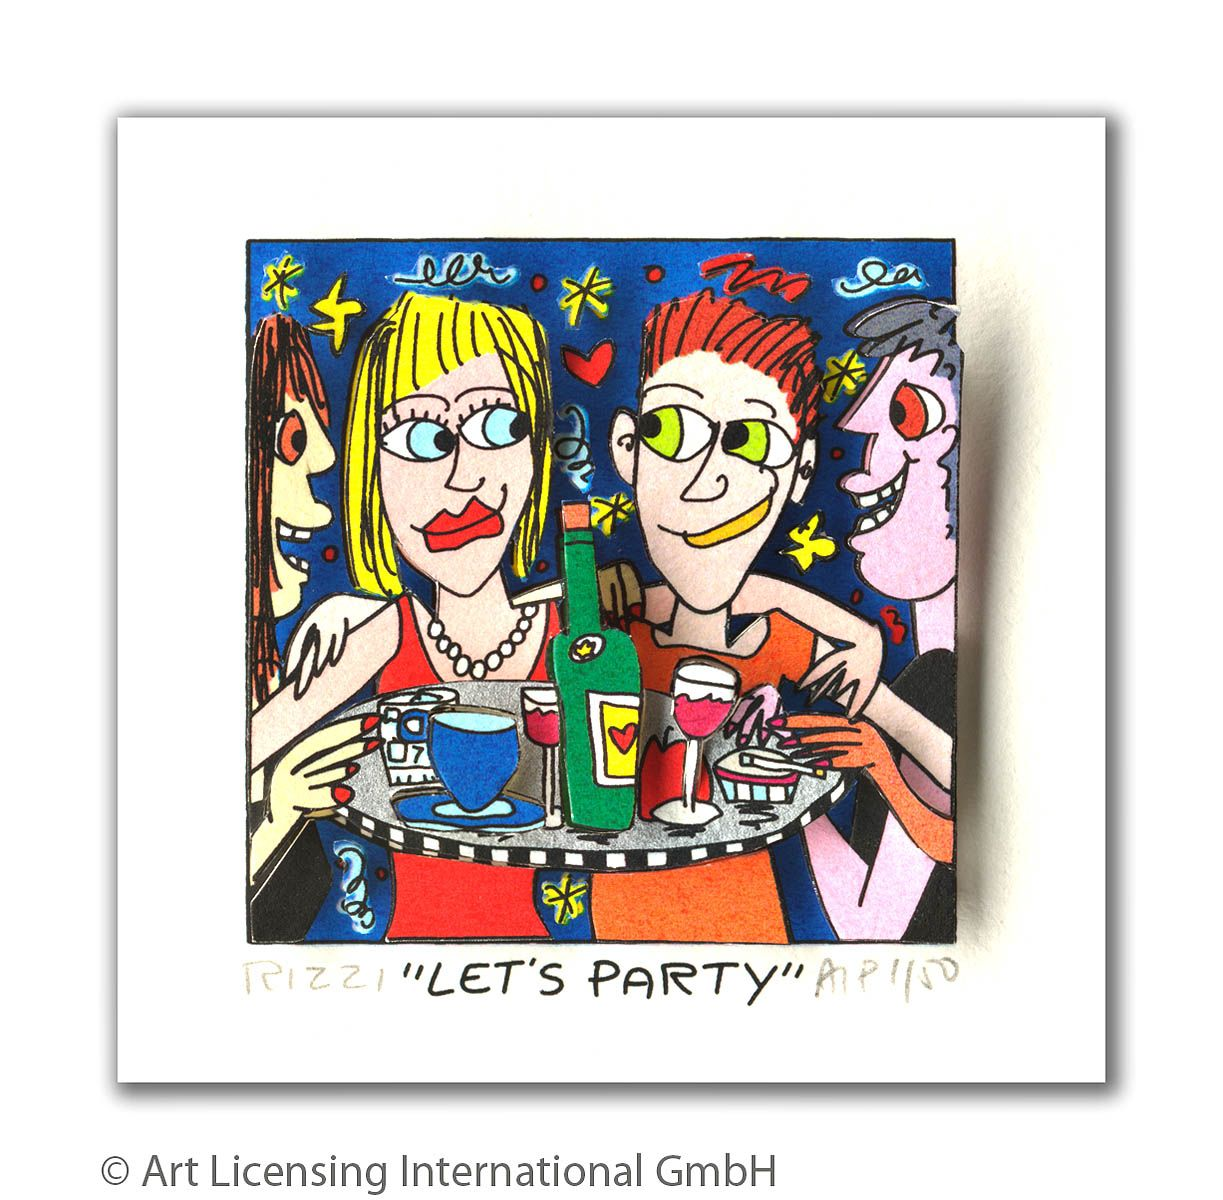 James Rizzi - LET'S PARTY